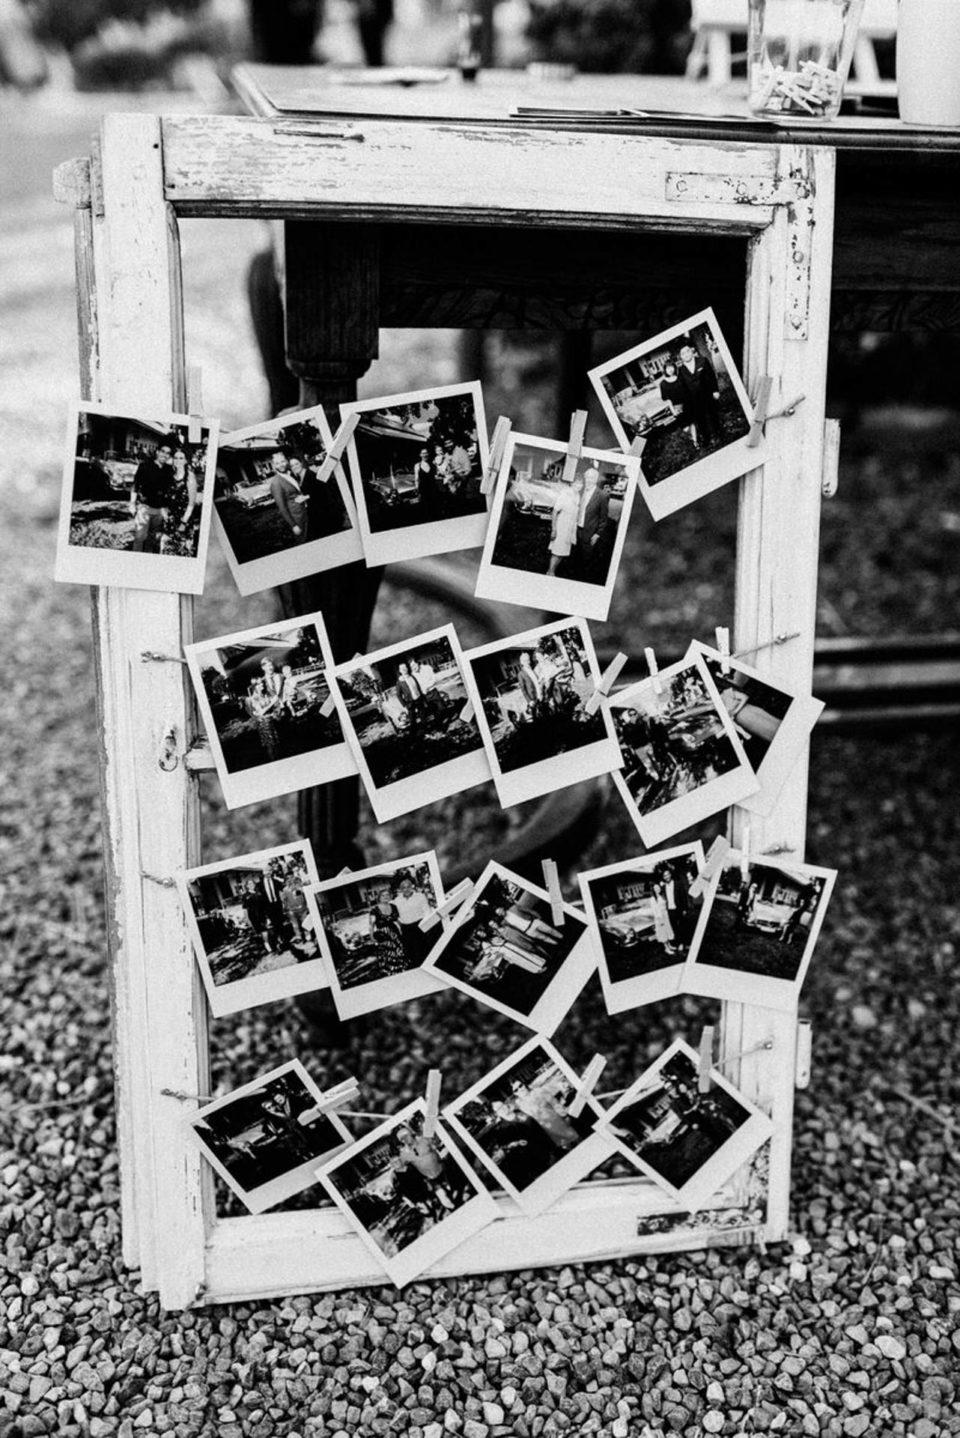 Vintage Bilderrahmen mit Polaroids